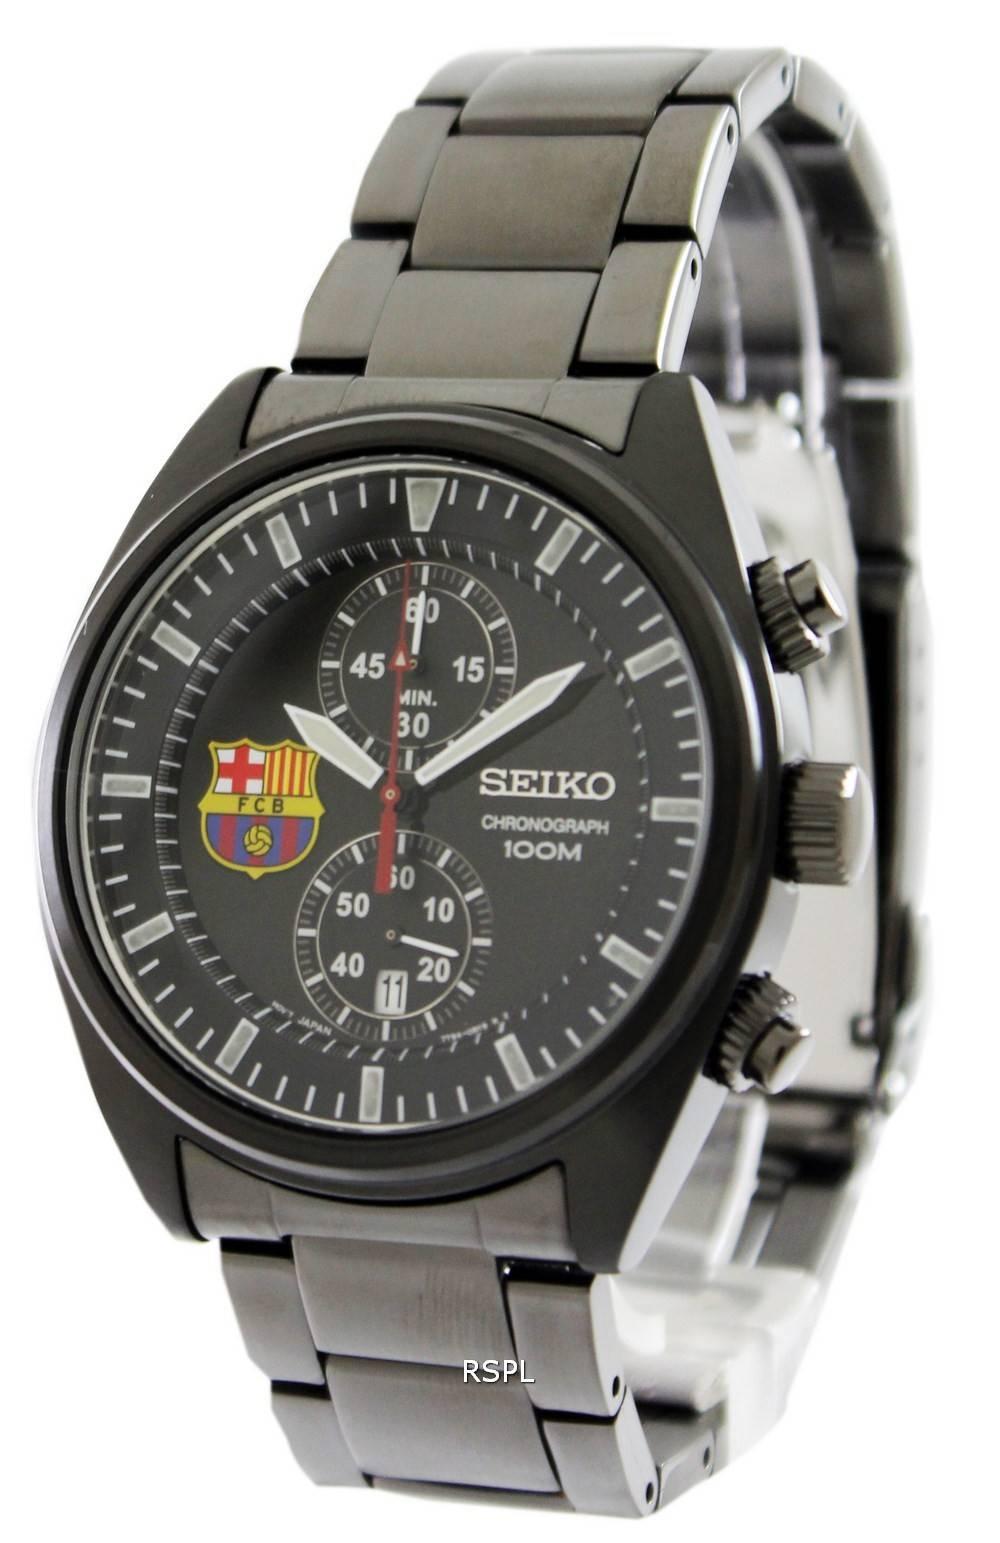 Seiko Chronograph FC Barcelona SNN267P1 SNN267P SNN267 Mens Watch -  CityWatches.co.nz 325a9bea75